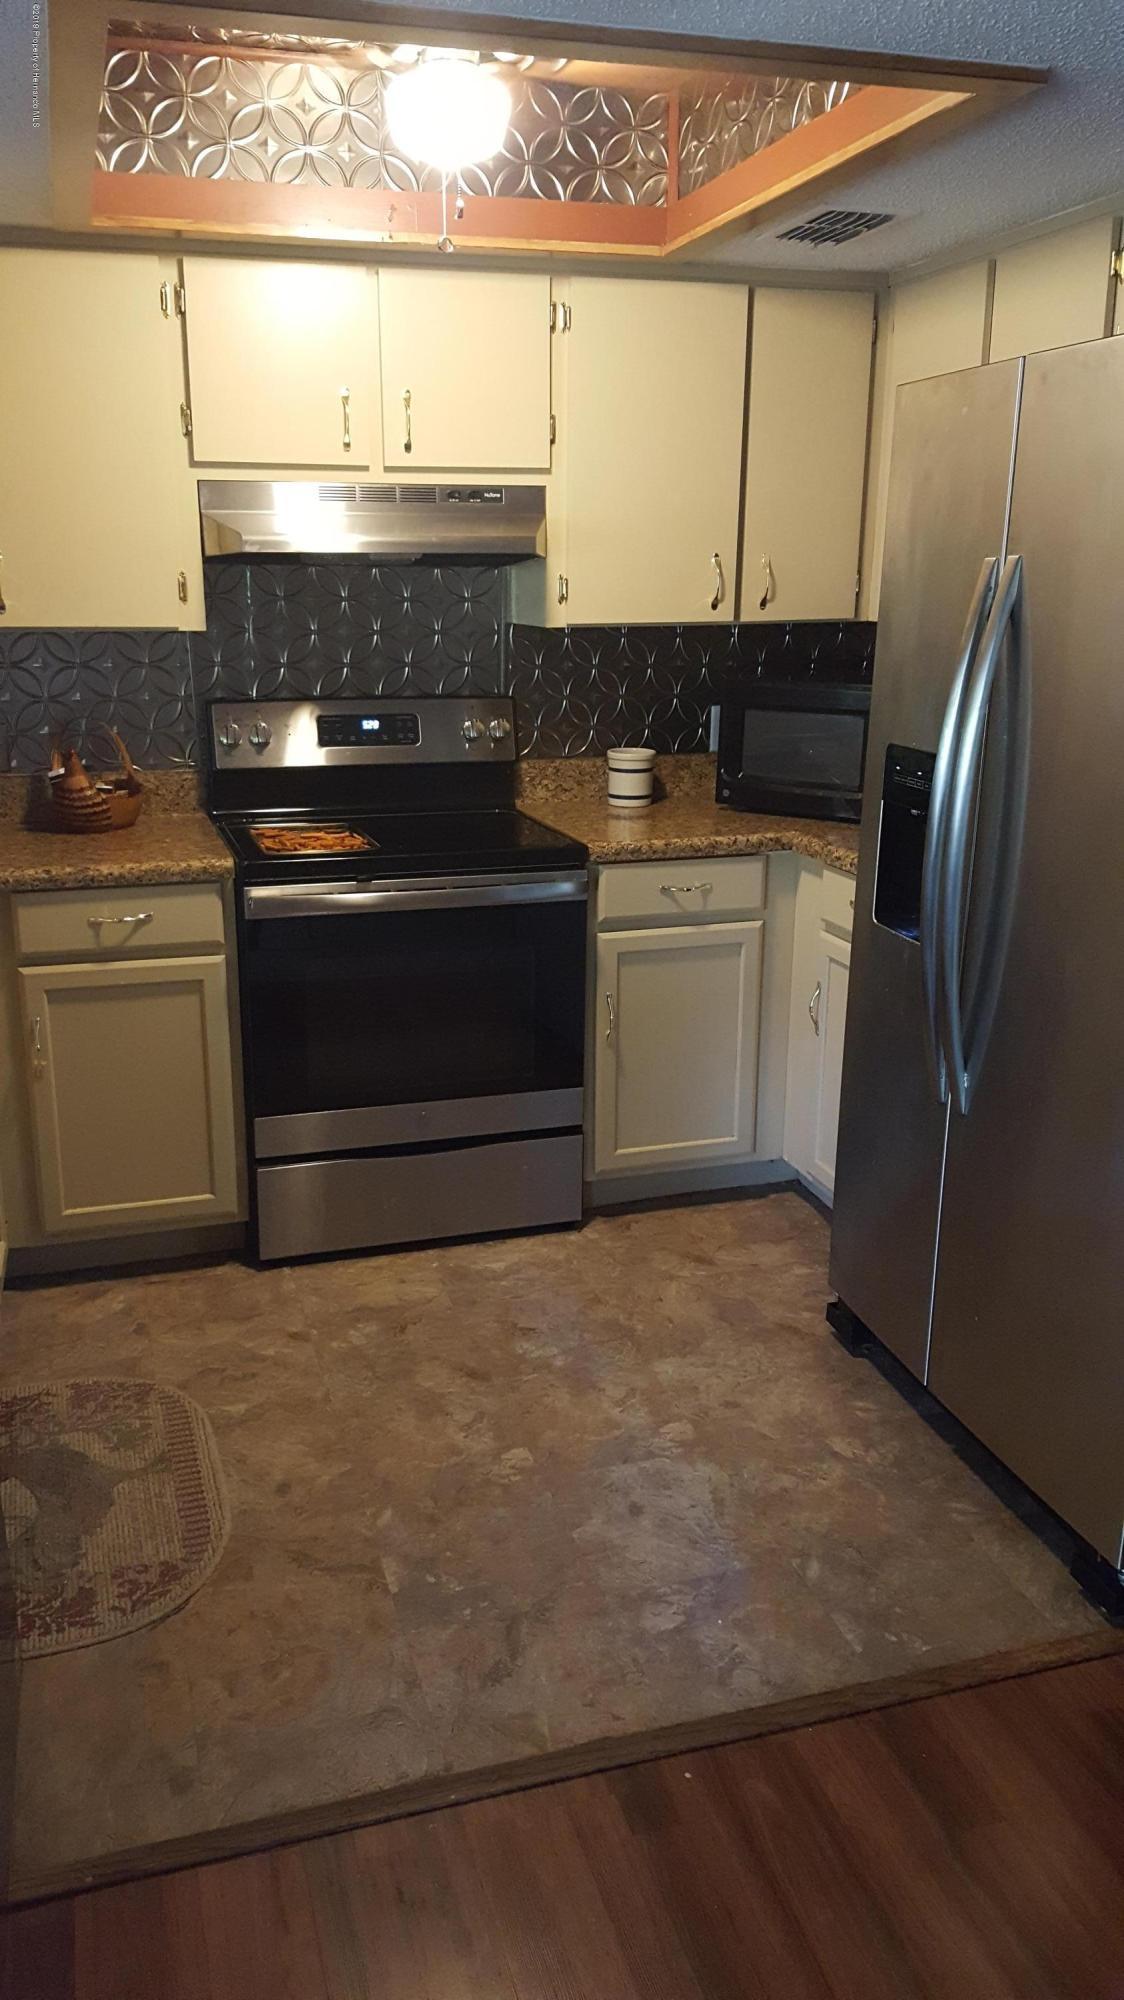 5360 Olancha Road, Ridge Manor, Florida 33523, 3 Bedrooms Bedrooms, ,2 BathroomsBathrooms,Residential,For Sale,Olancha,2199585